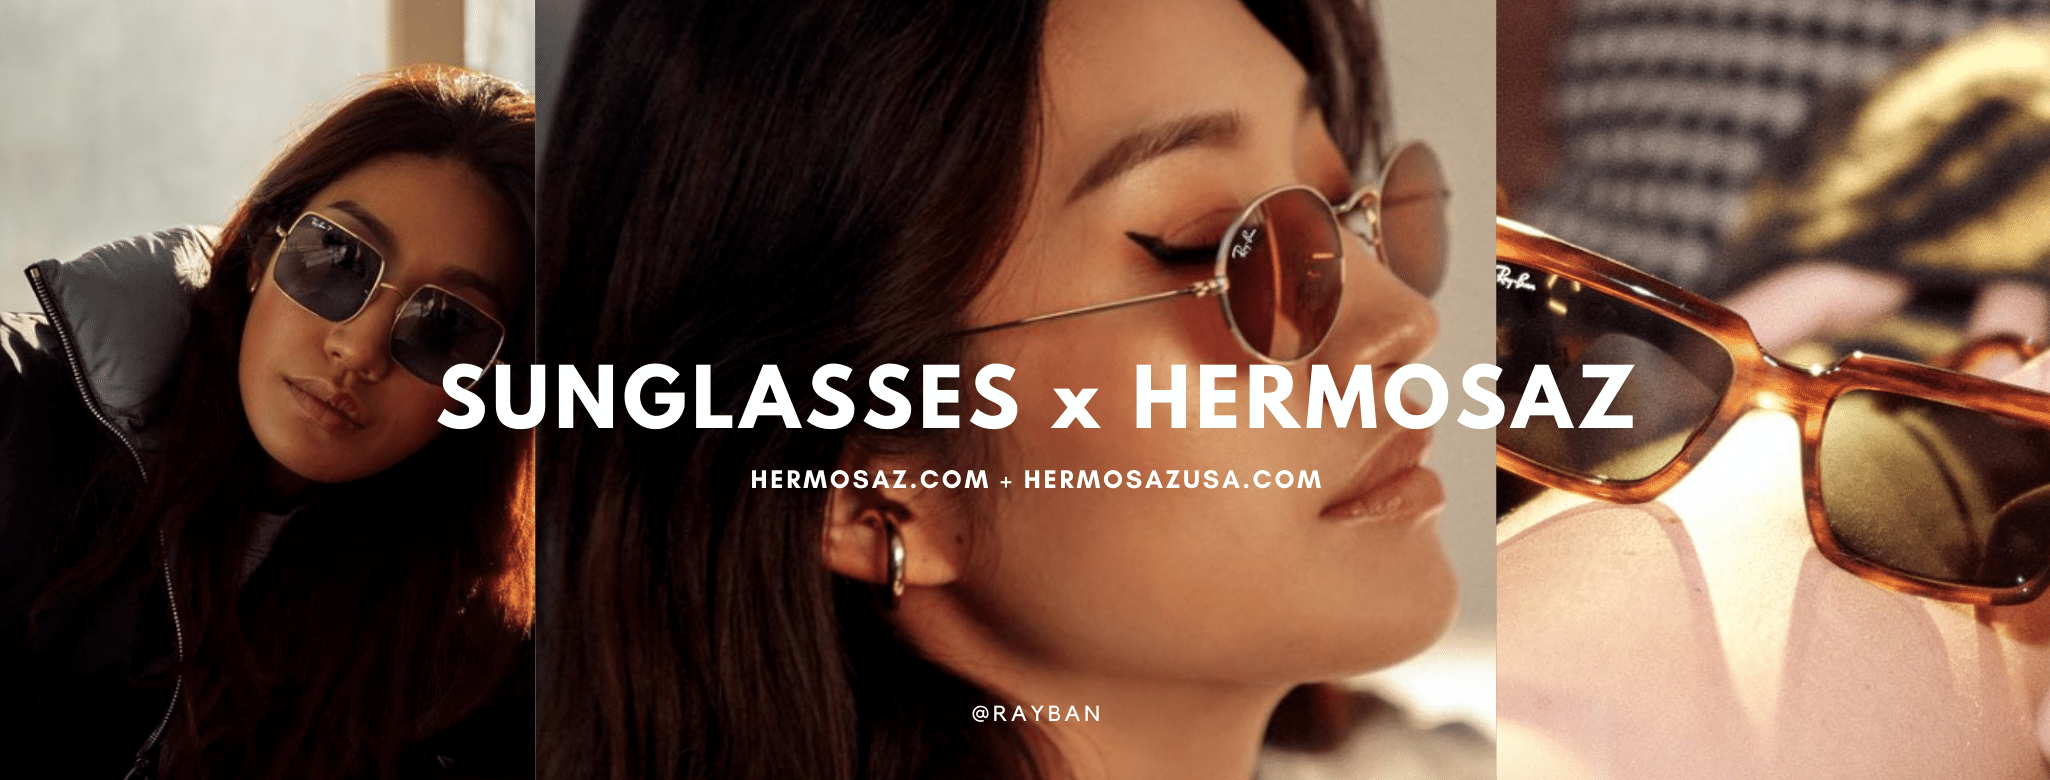 Sunglasses x Hermosaz